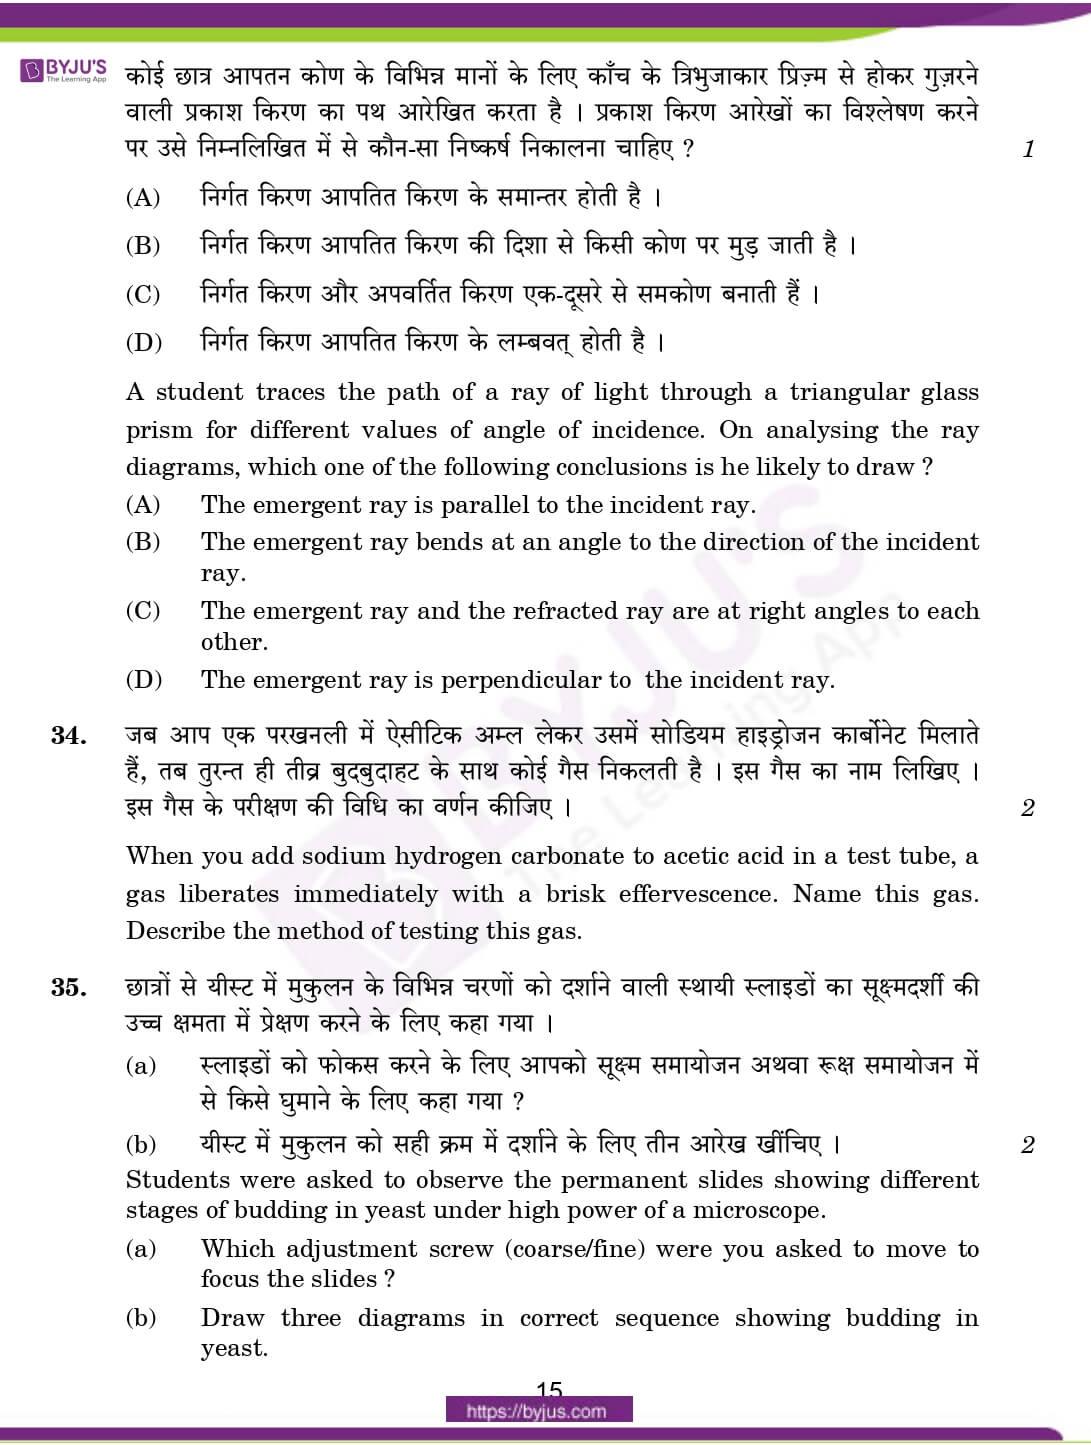 cbse class 10 science sample paper sa 2 set 5